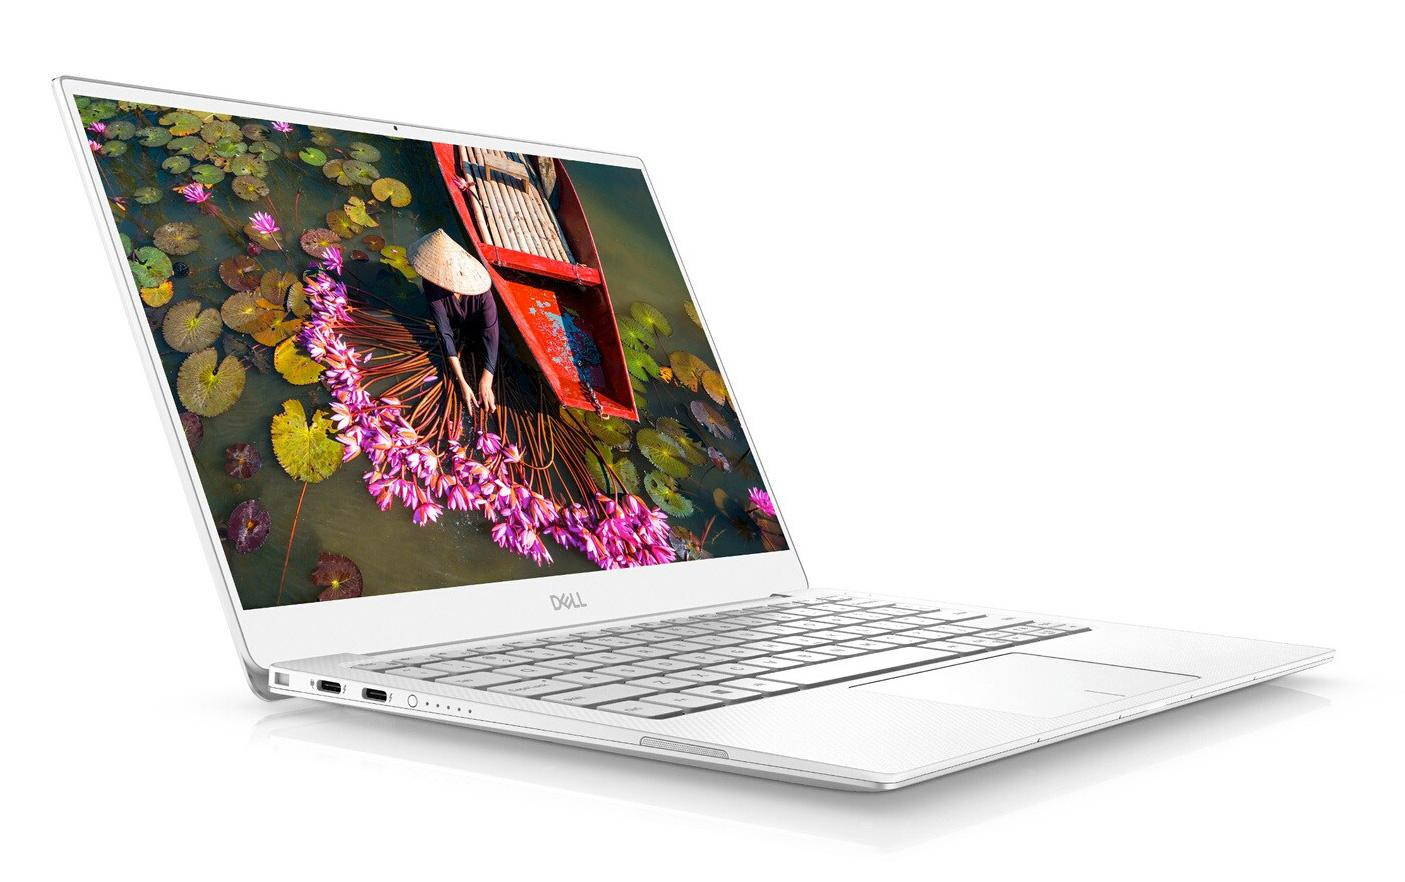 Ordinateur portable Dell XPS 13 7390 Blanc - Core i5, 8 Go, 512 Go - photo 4